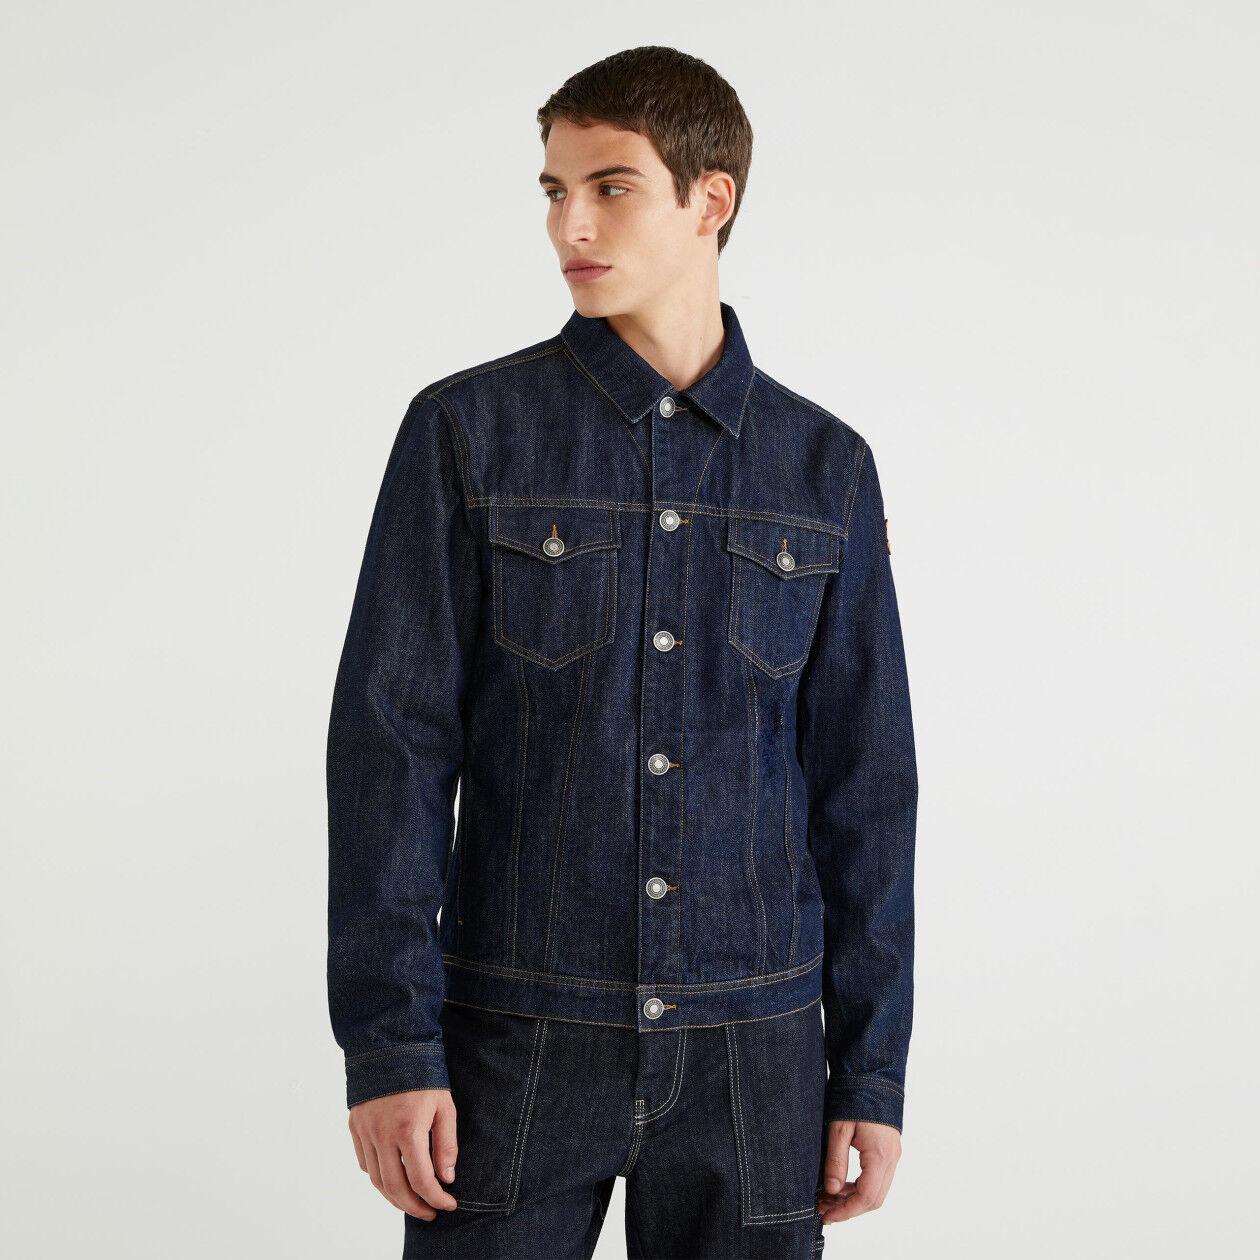 """Keith Haring"" jean jacket"